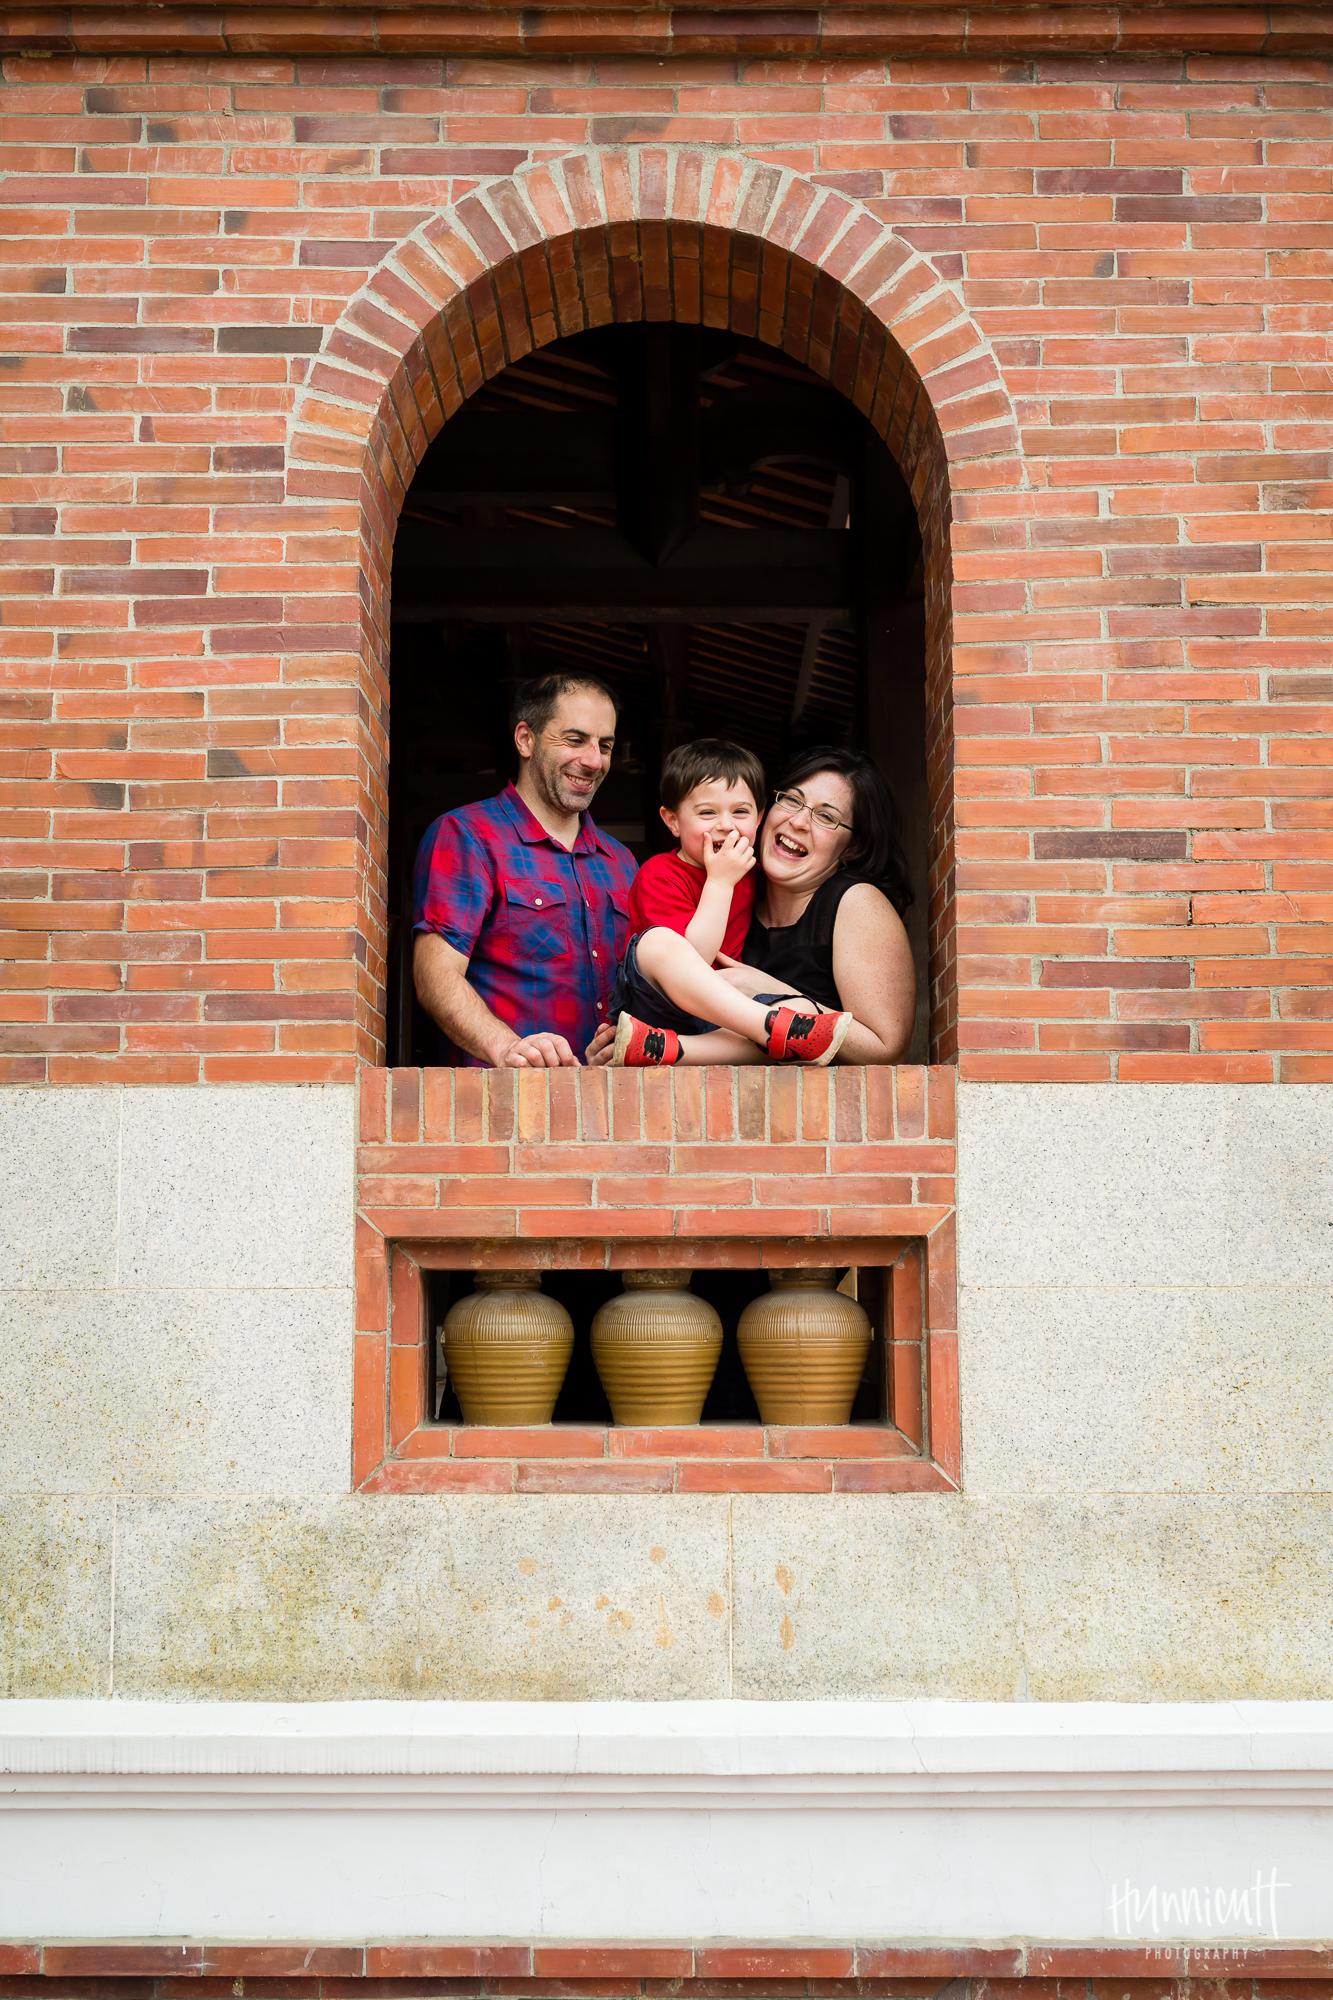 Family-Outdoor-Lifestyle-Modern-Urban-Travel-Culture-HunnicuttPhotography-RebeccaHunnicuttFarren-Taichung-Taiwan-6